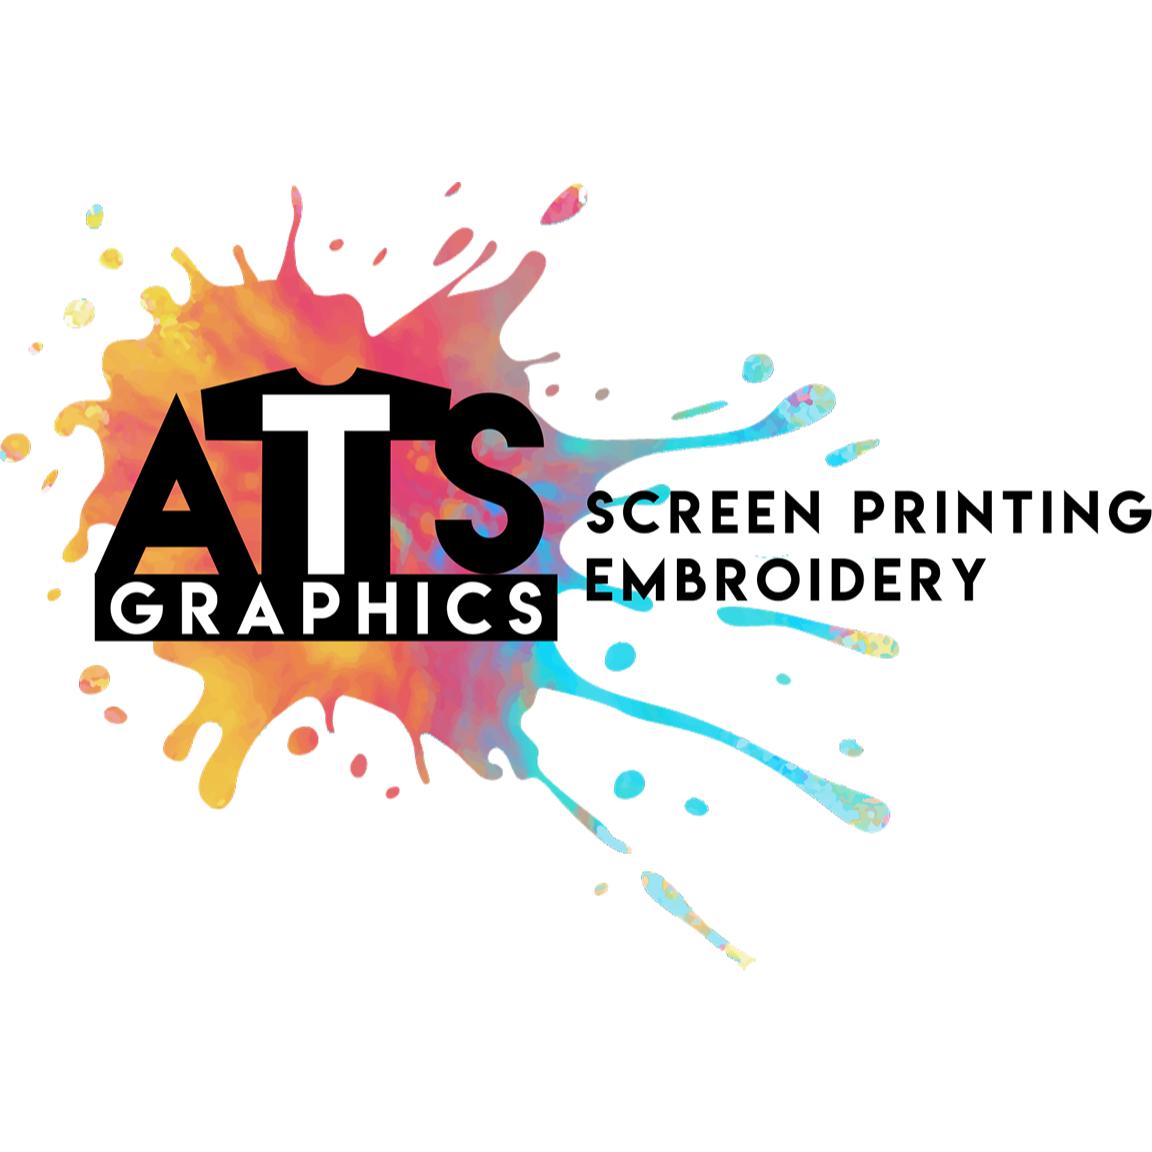 ATS Graphics